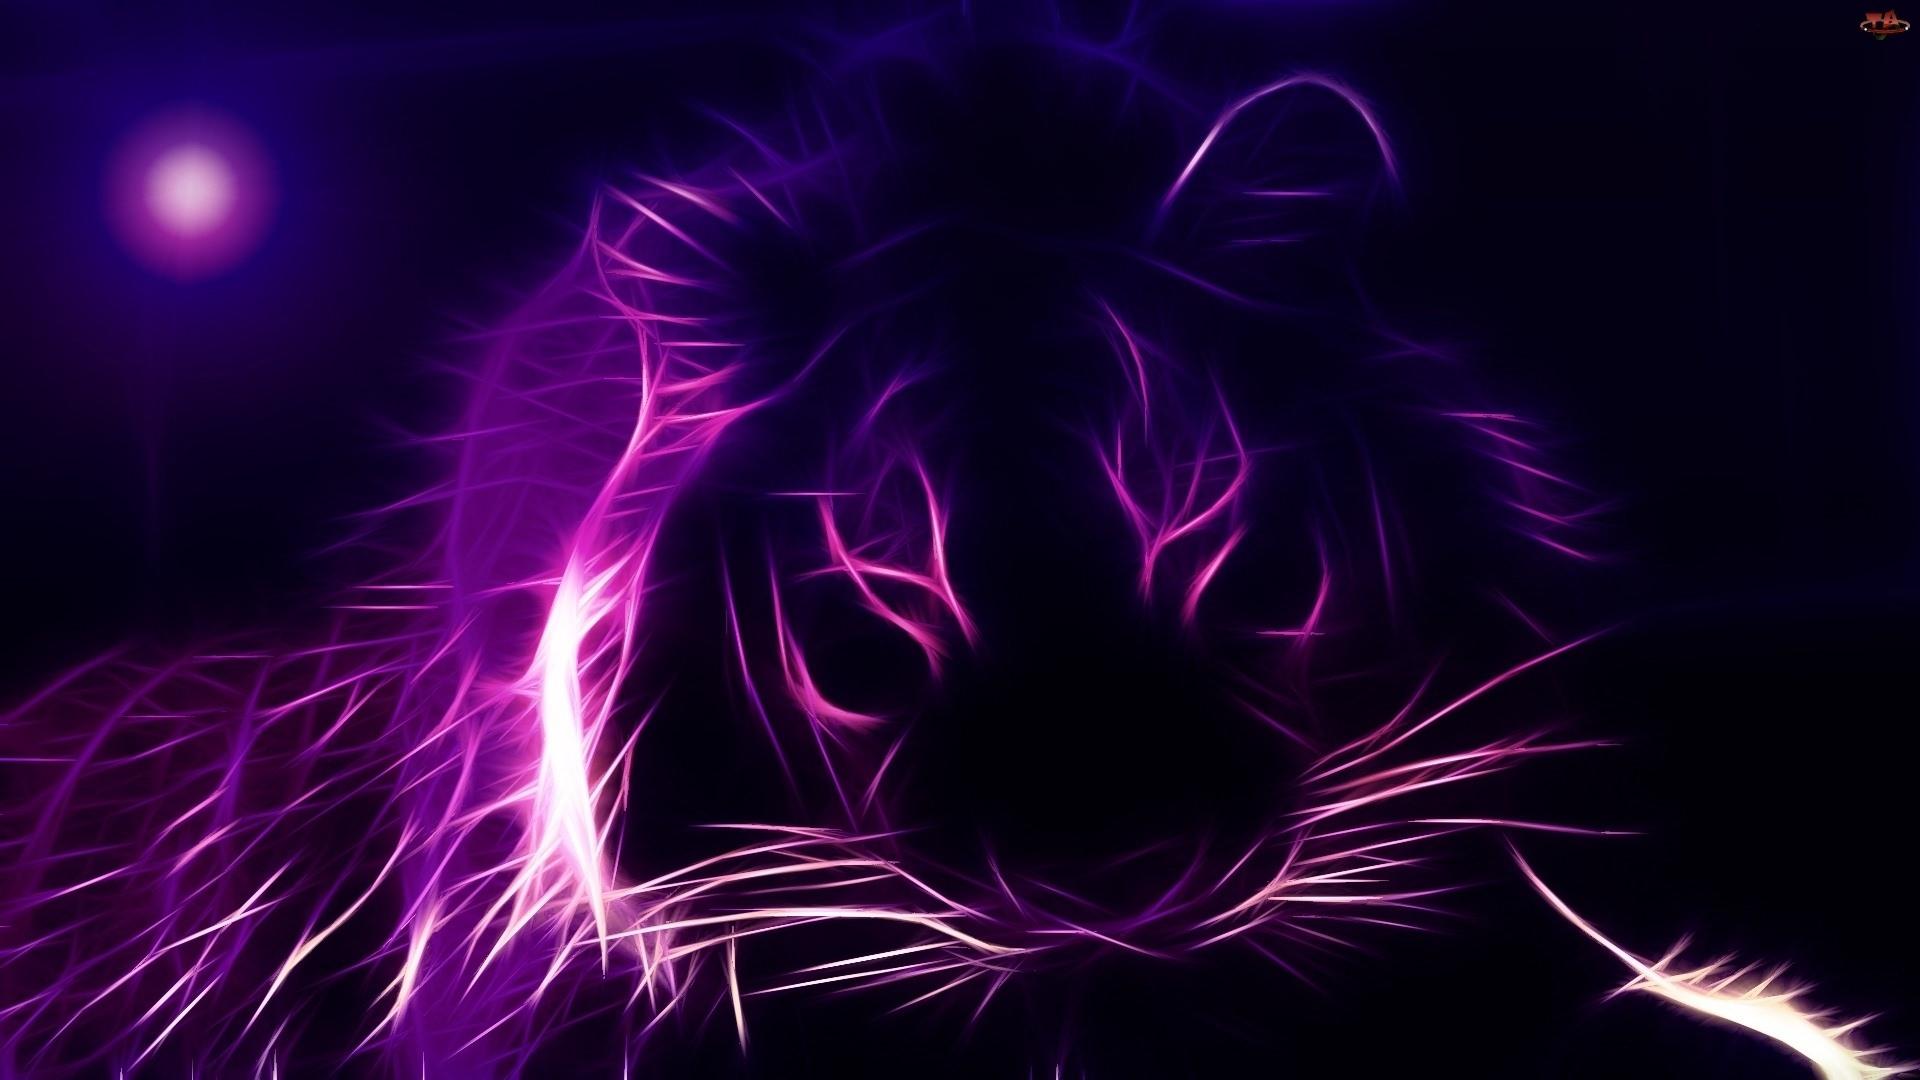 210 amazing purple backgrounds backgrounds design trends for Fon decran swag